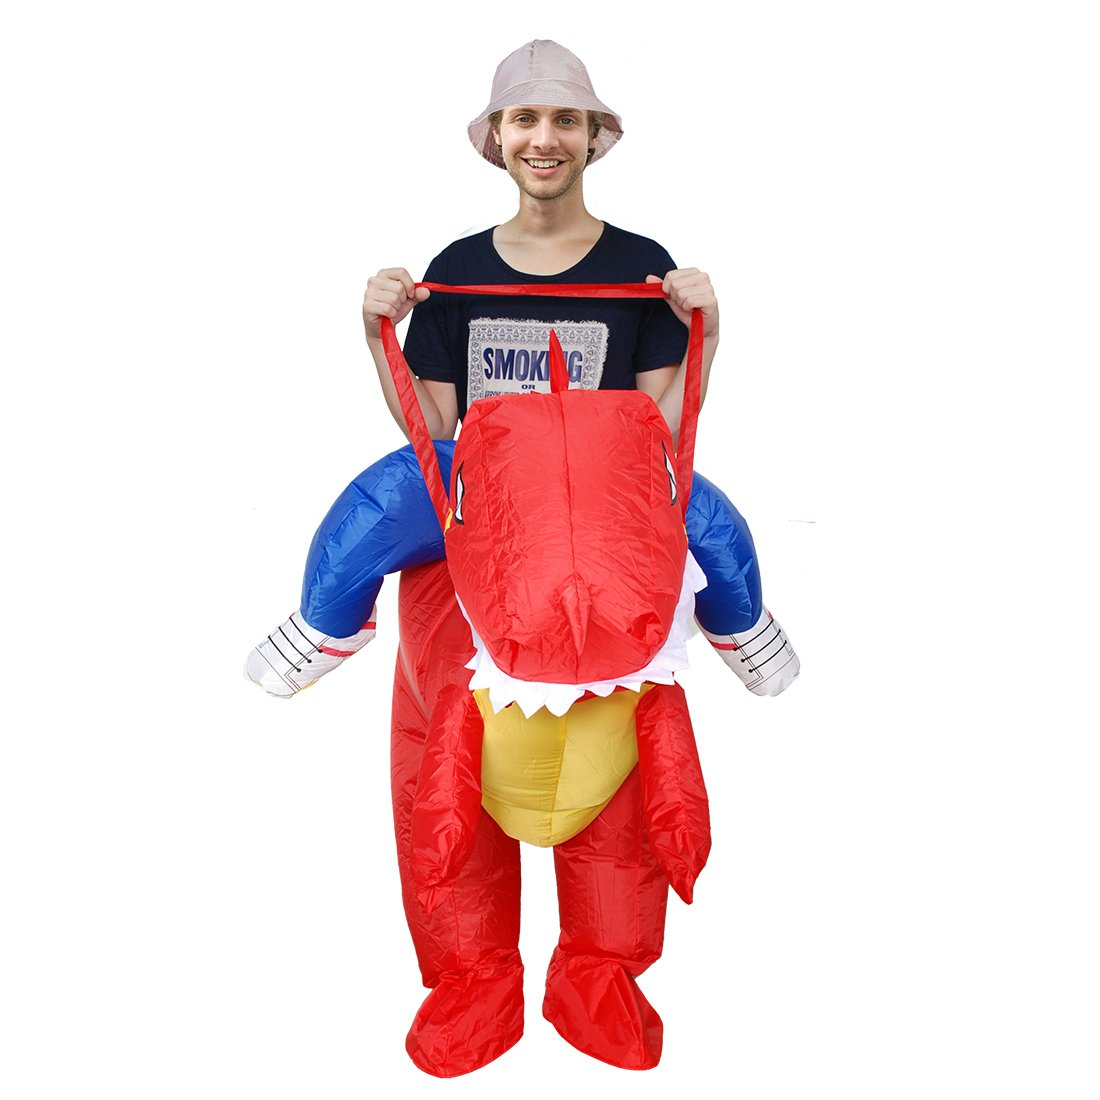 Kooy Inflatable Dinosaur Unicorn Cowboy Costume Halloween Costume Inflatable Costumes for Adults (red Dinosaur) by Kooy (Image #2)